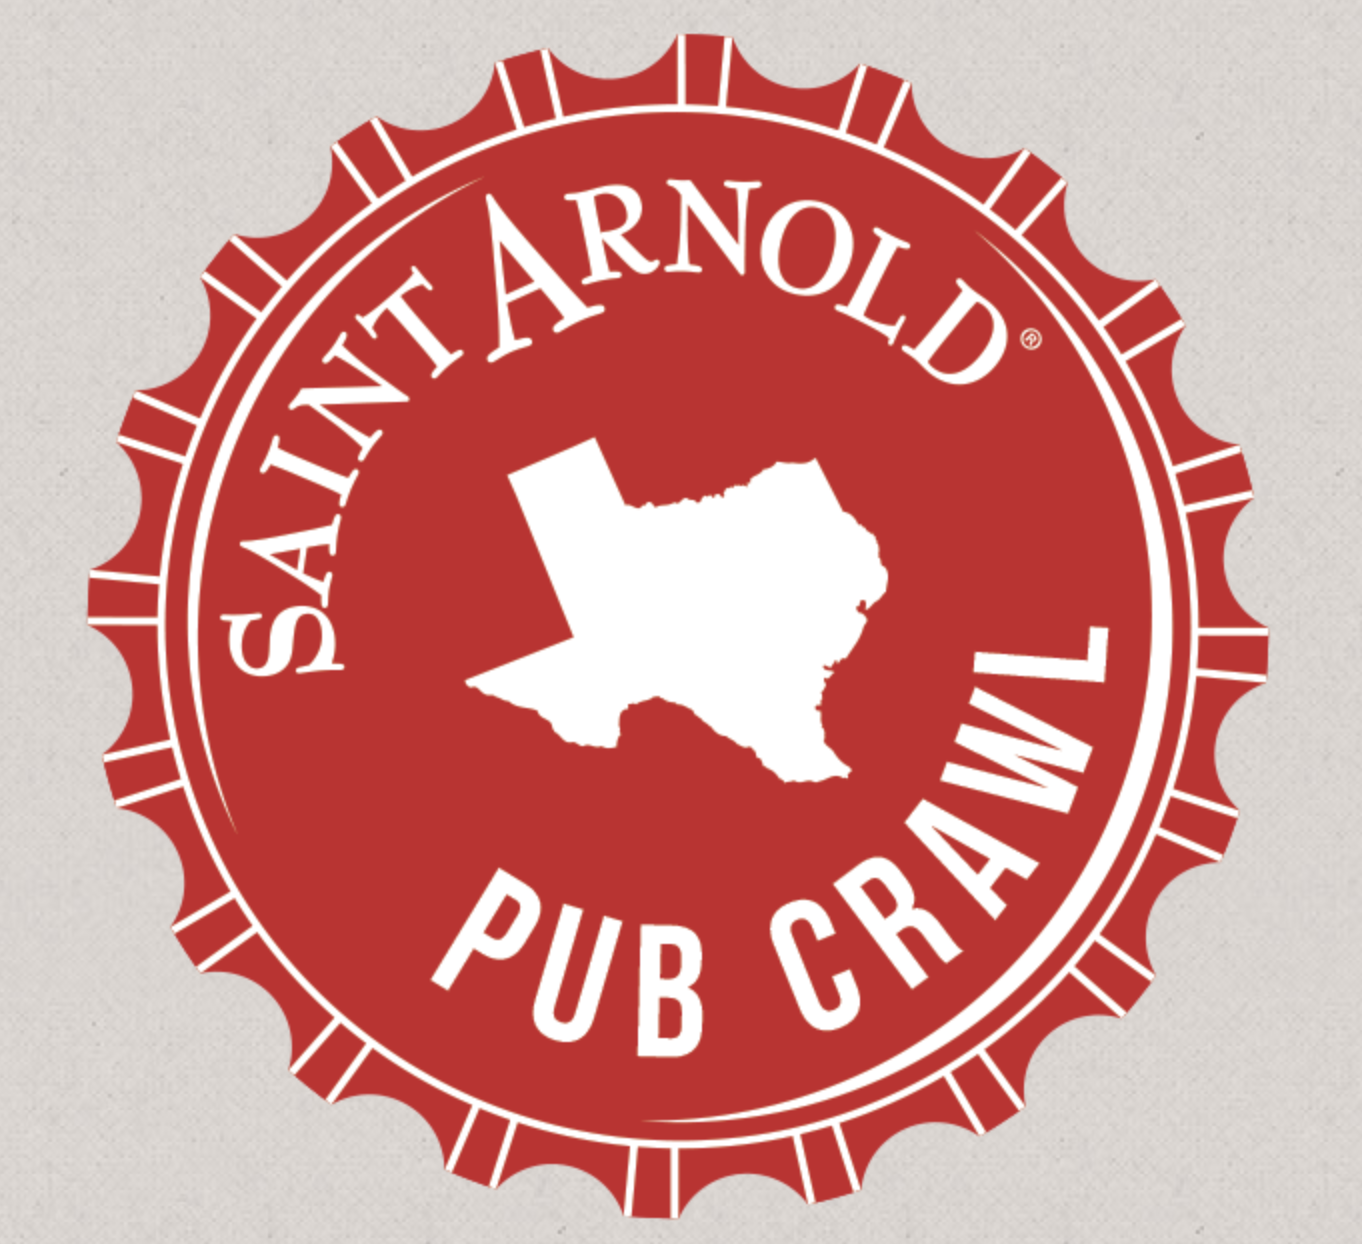 St Arnold Pub Crawl